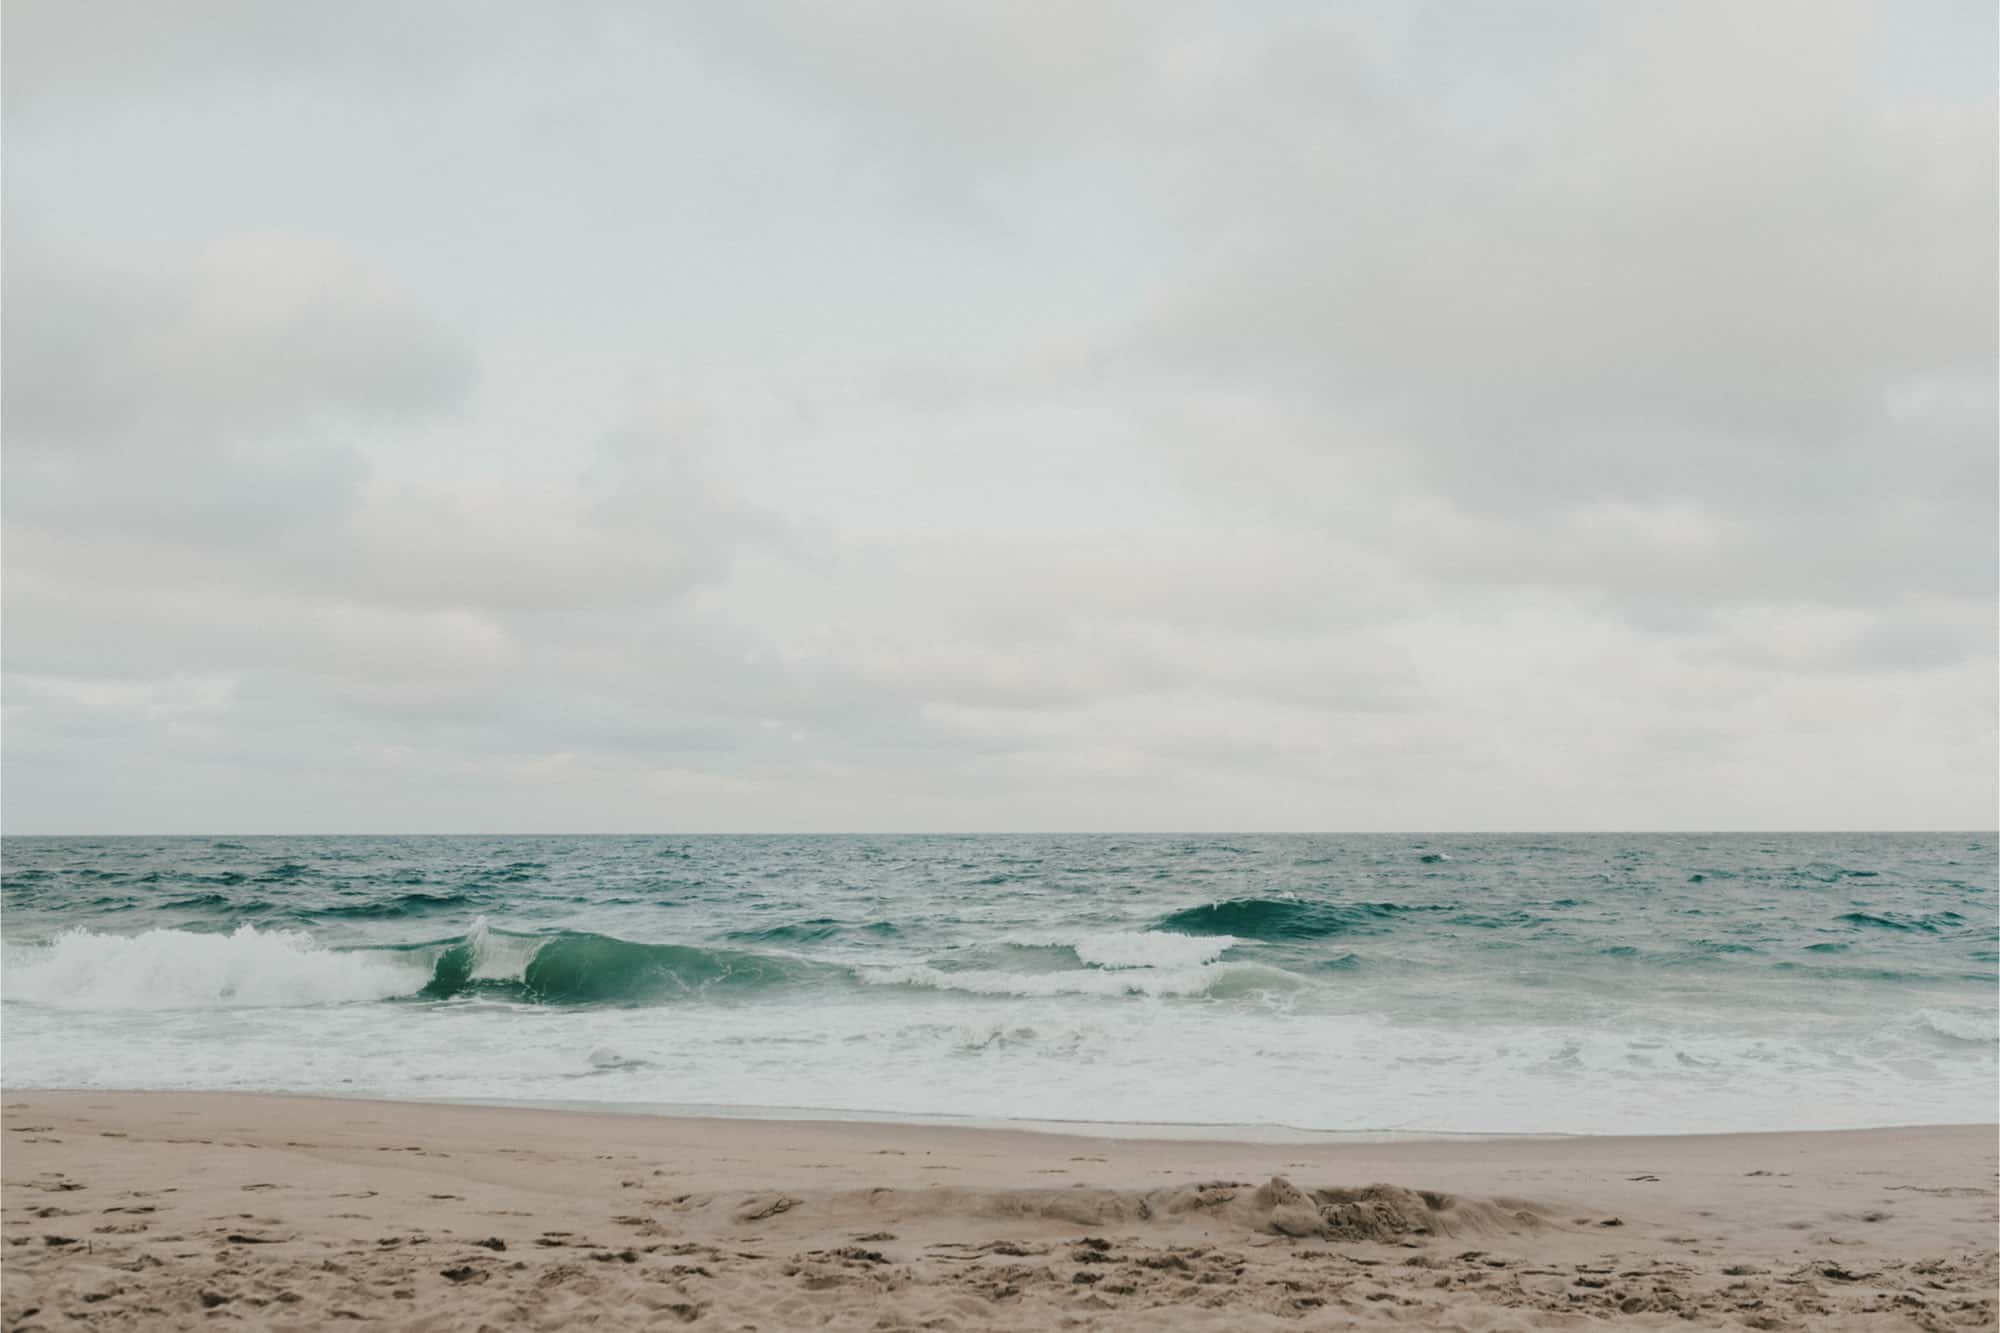 Waves crashing on sandy beach